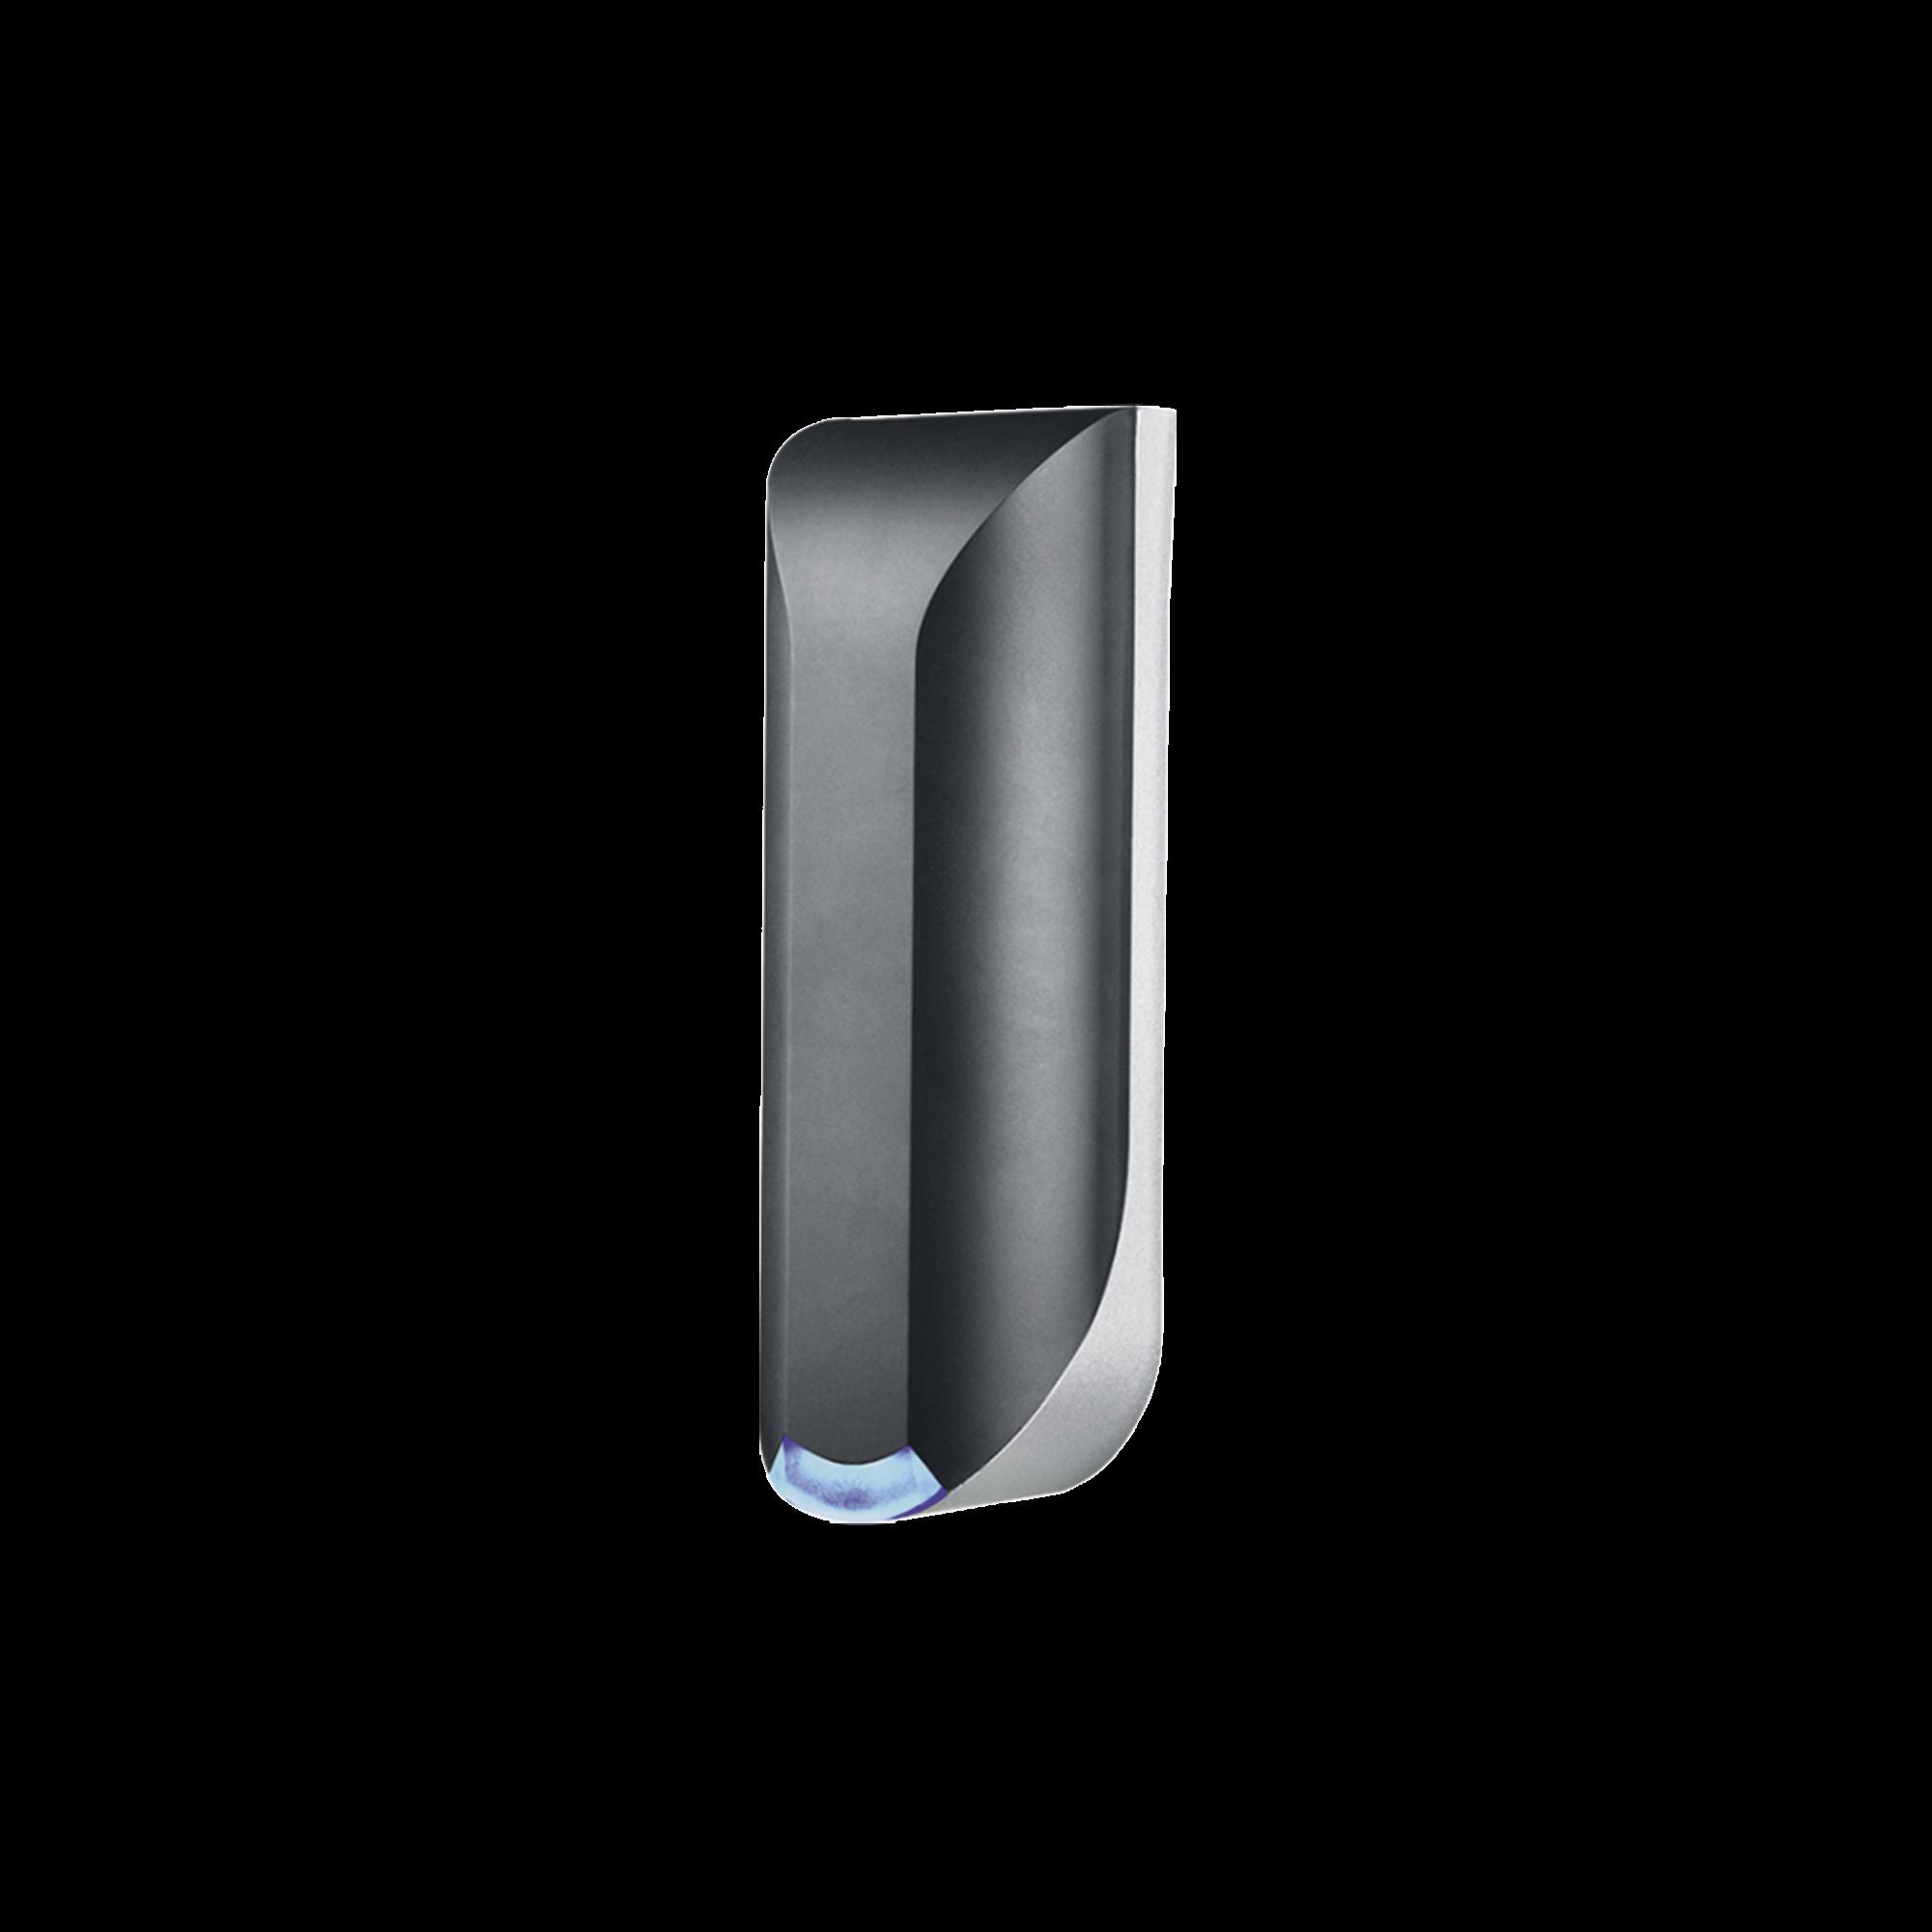 Lector UPASS ACCESS (2 metros de alcance) UHF/900 Mhz, compatible con tarjetas EPCGEN2